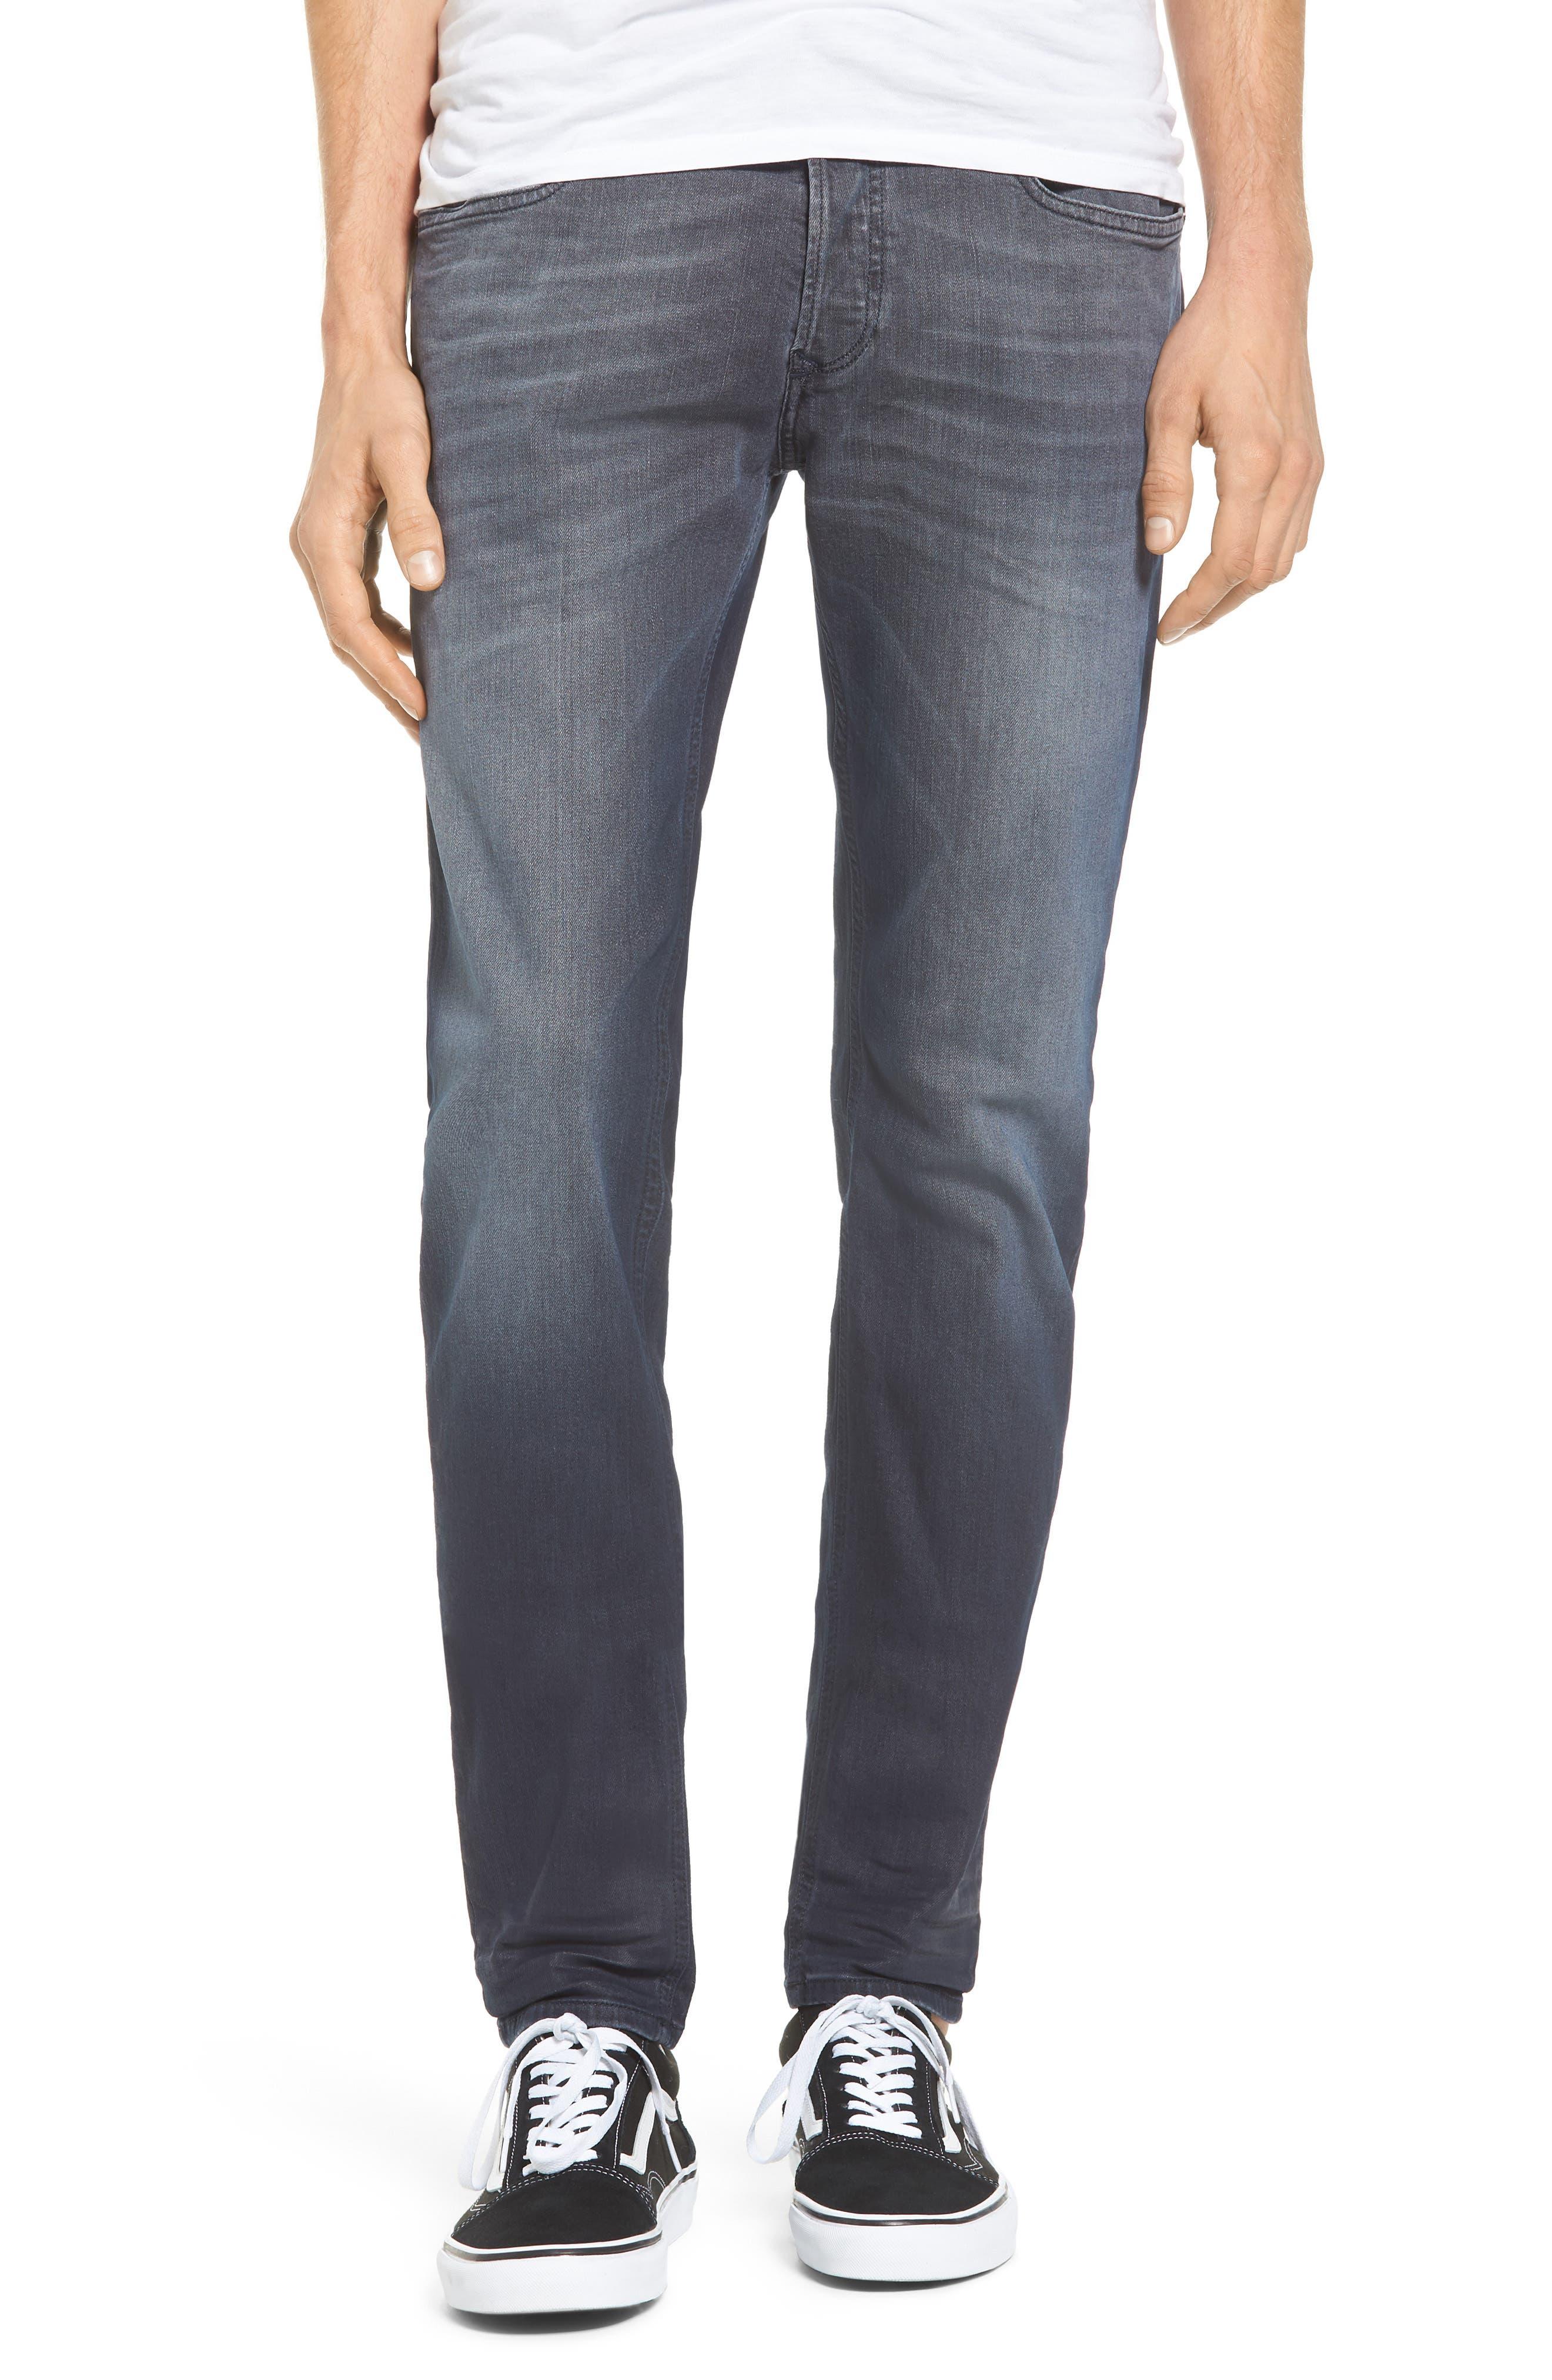 Sleenker Skinny Fit Jeans,                             Main thumbnail 1, color,                             400